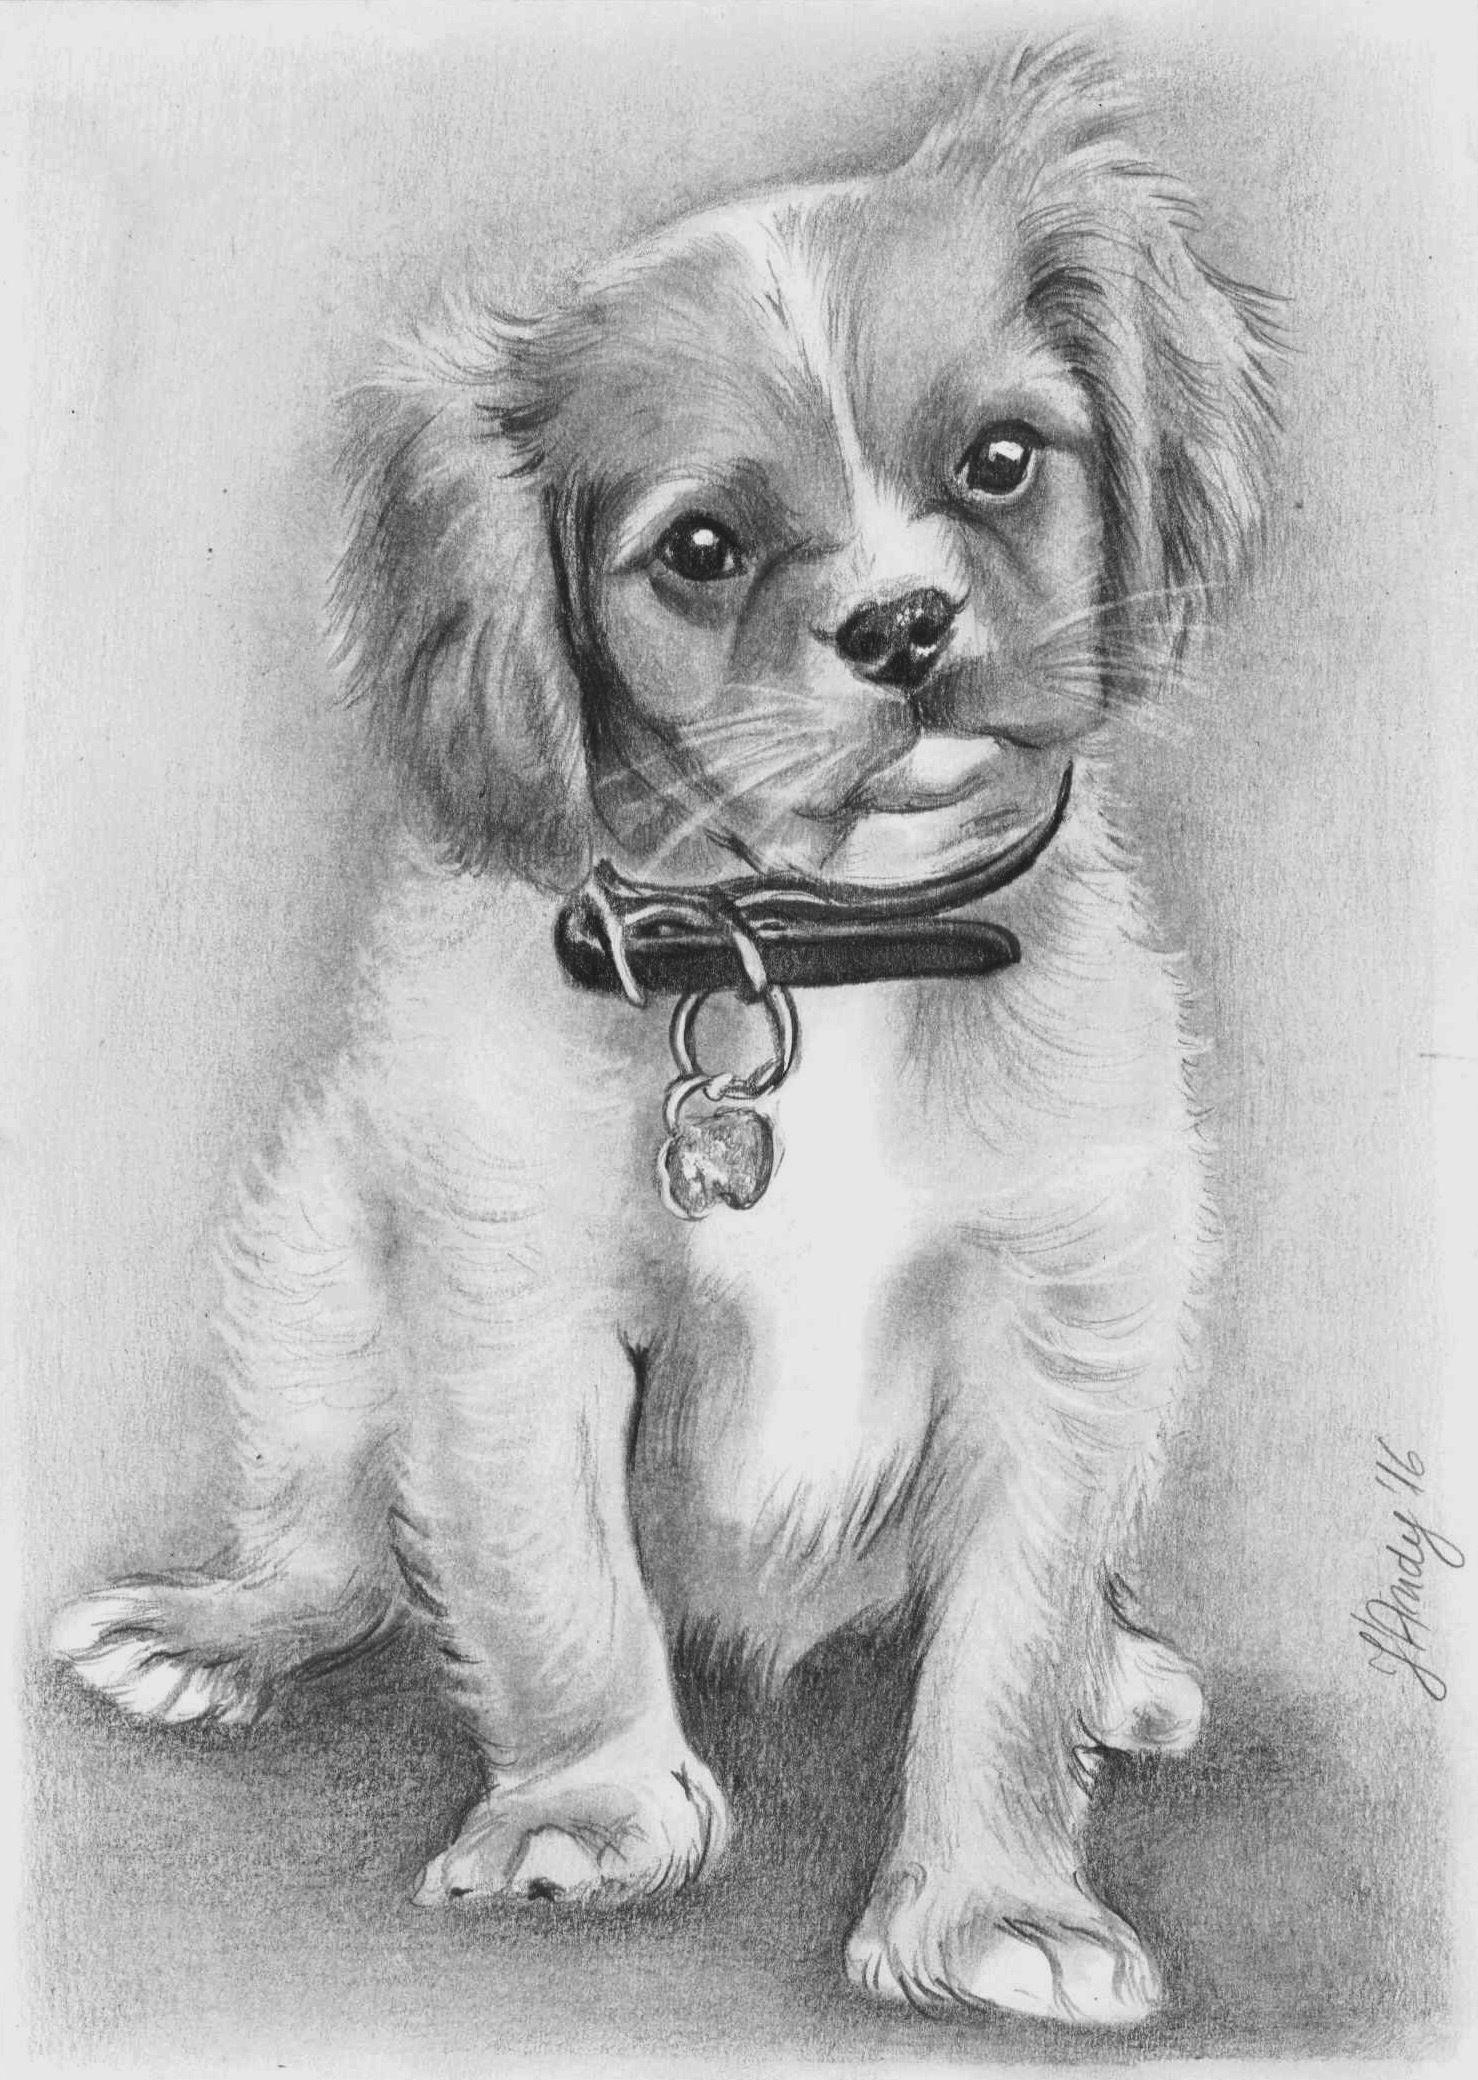 Cute dog pencil drawing | Dog pencil drawing, Drawings ...